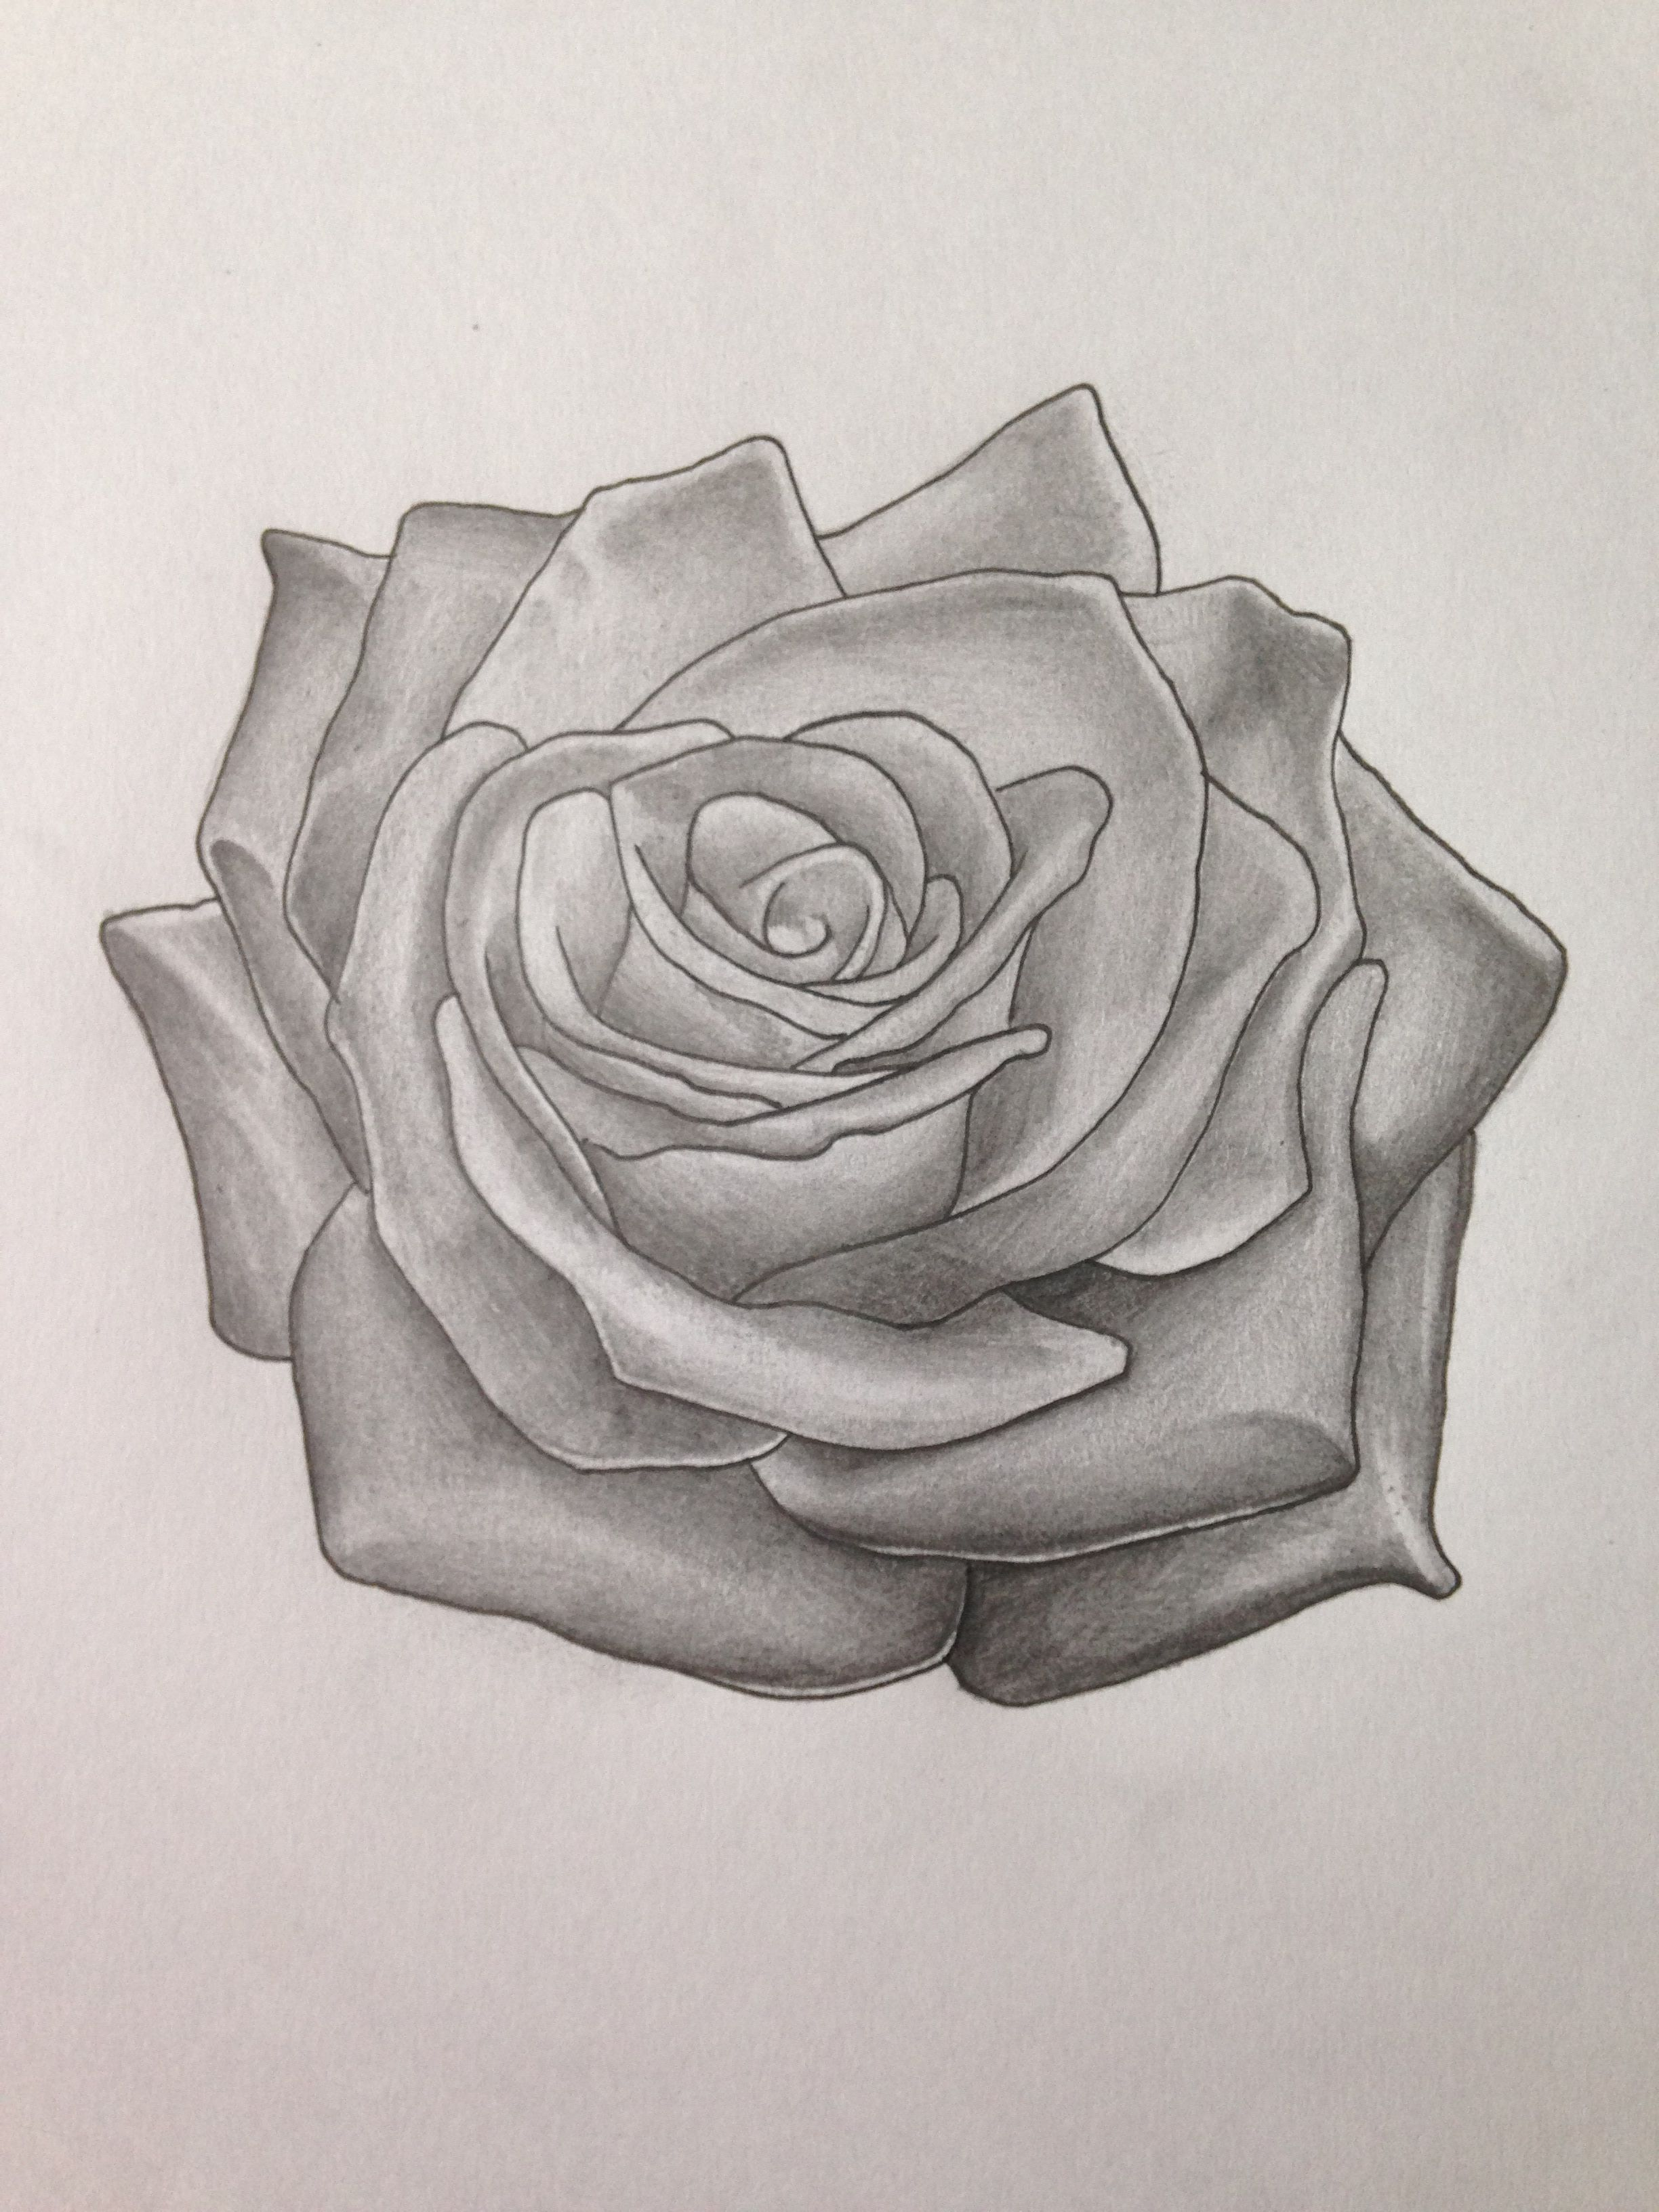 Hand Drawn Rose Tattoo Design using Pencil Rose tattoo